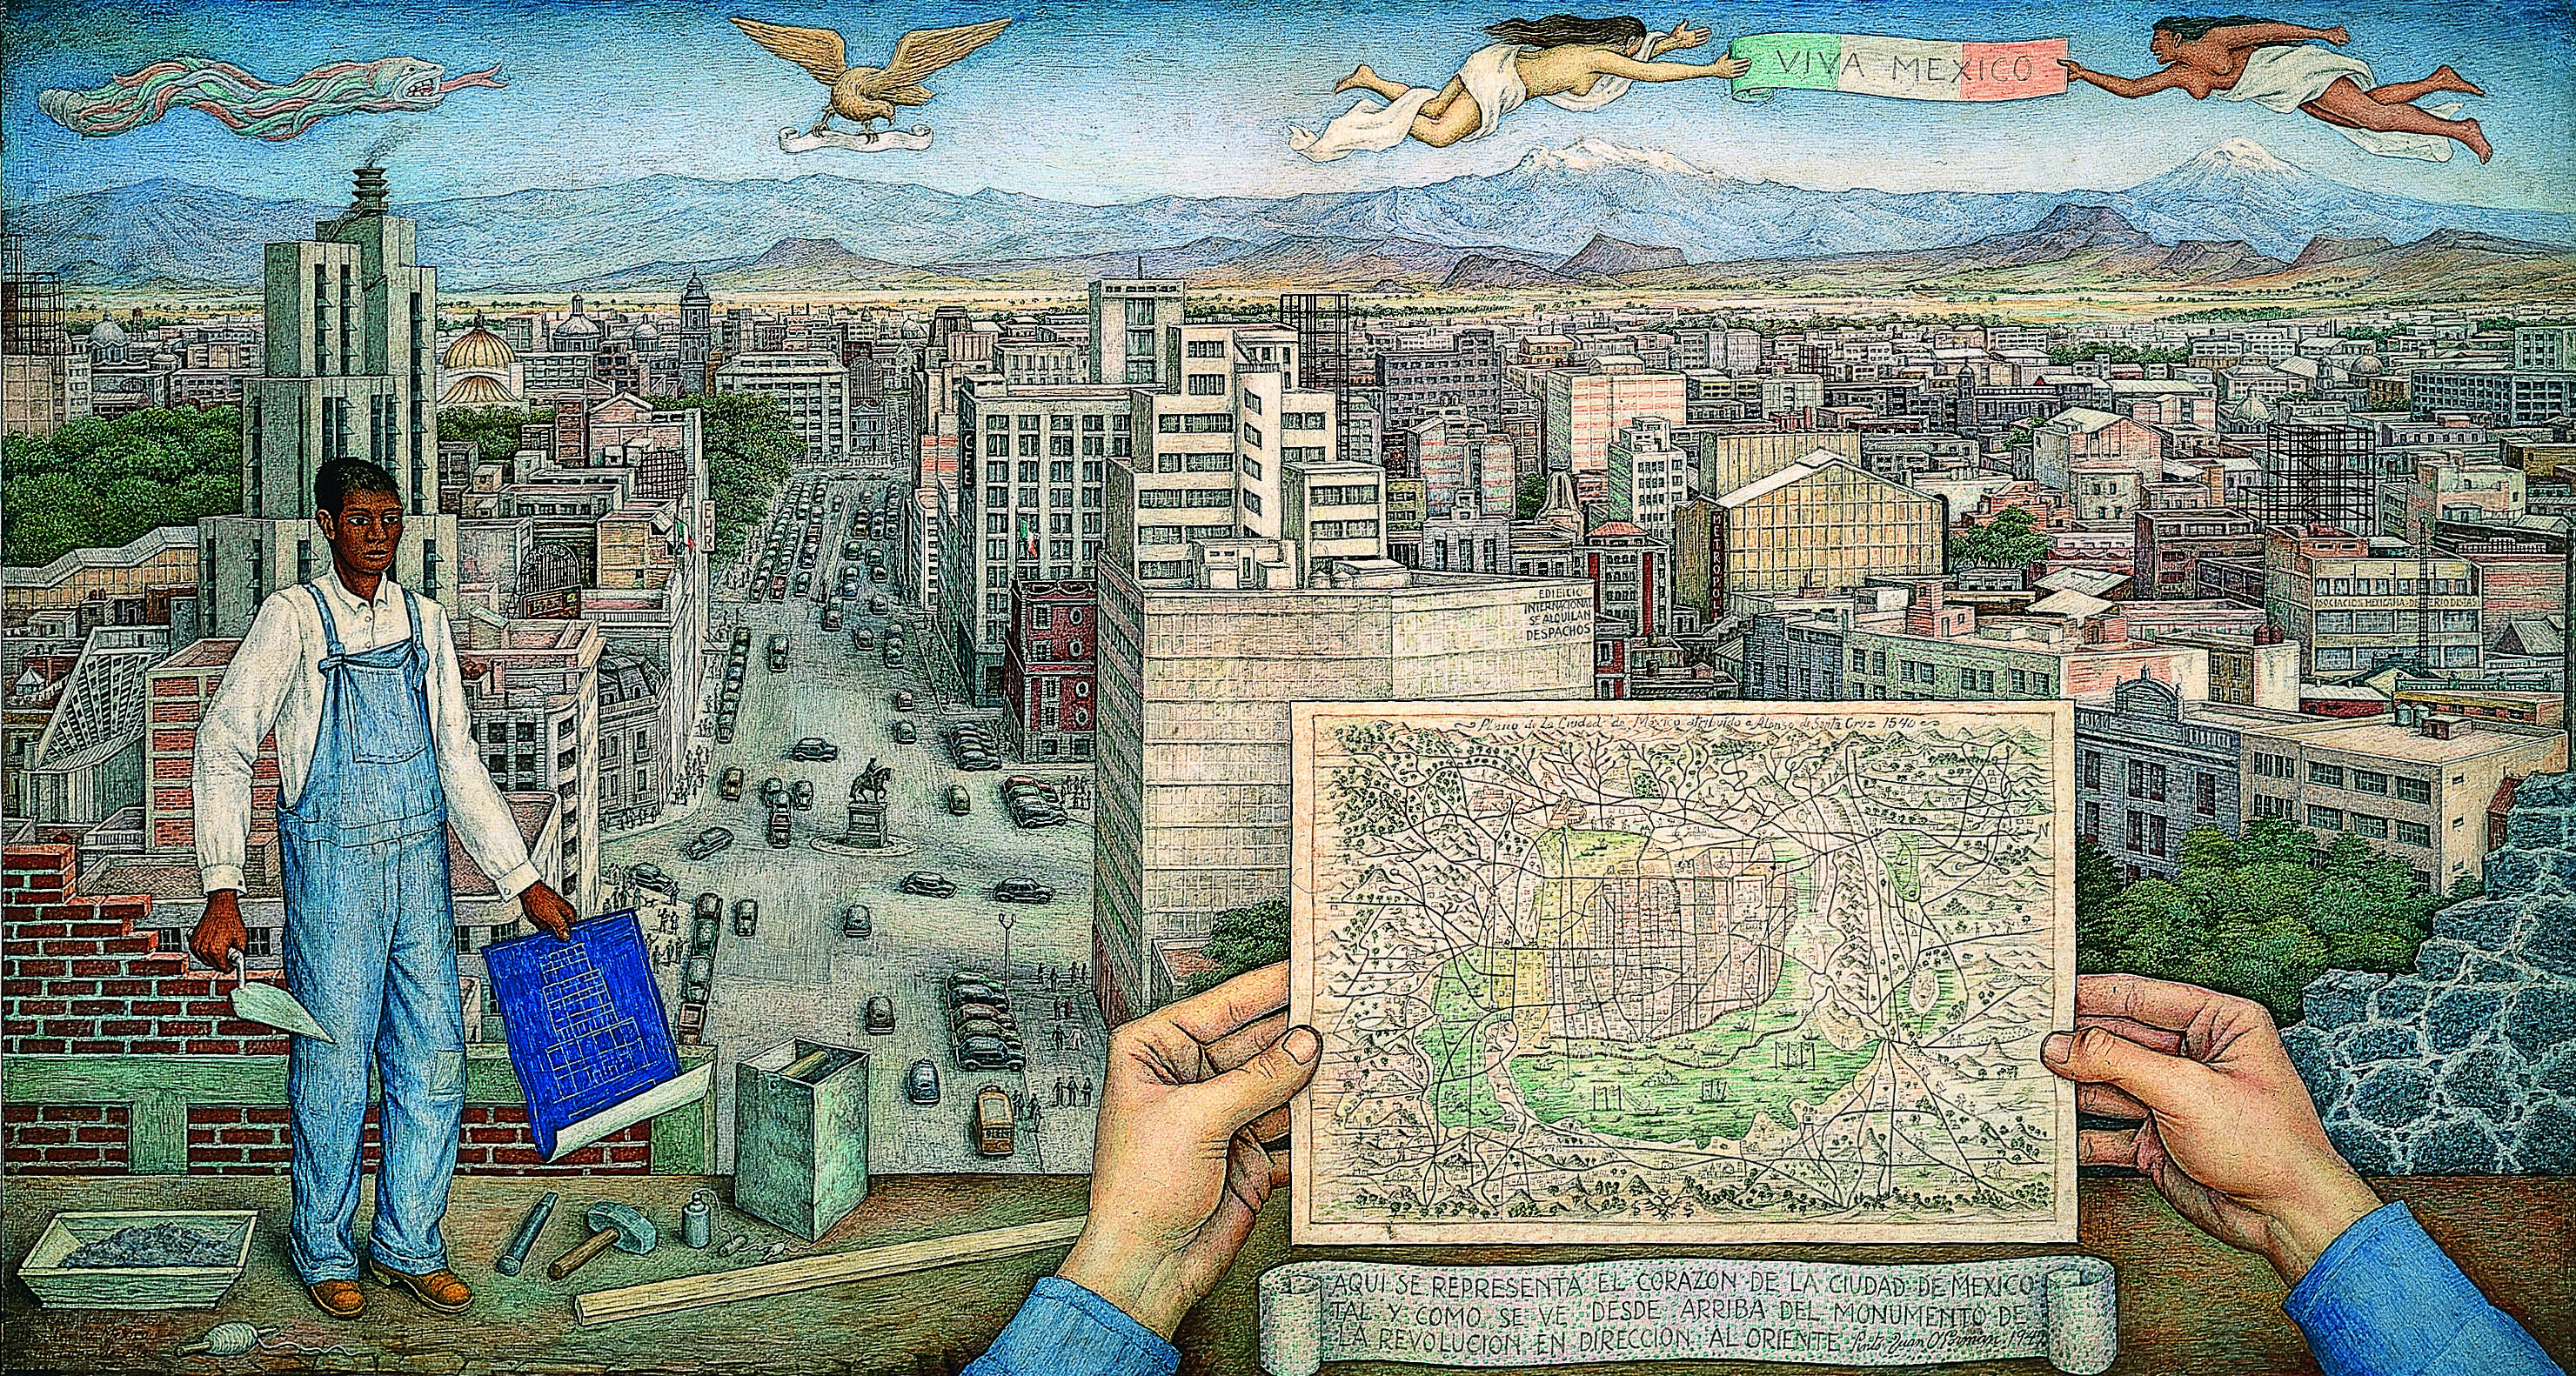 MEX Image 8 - Mexico City